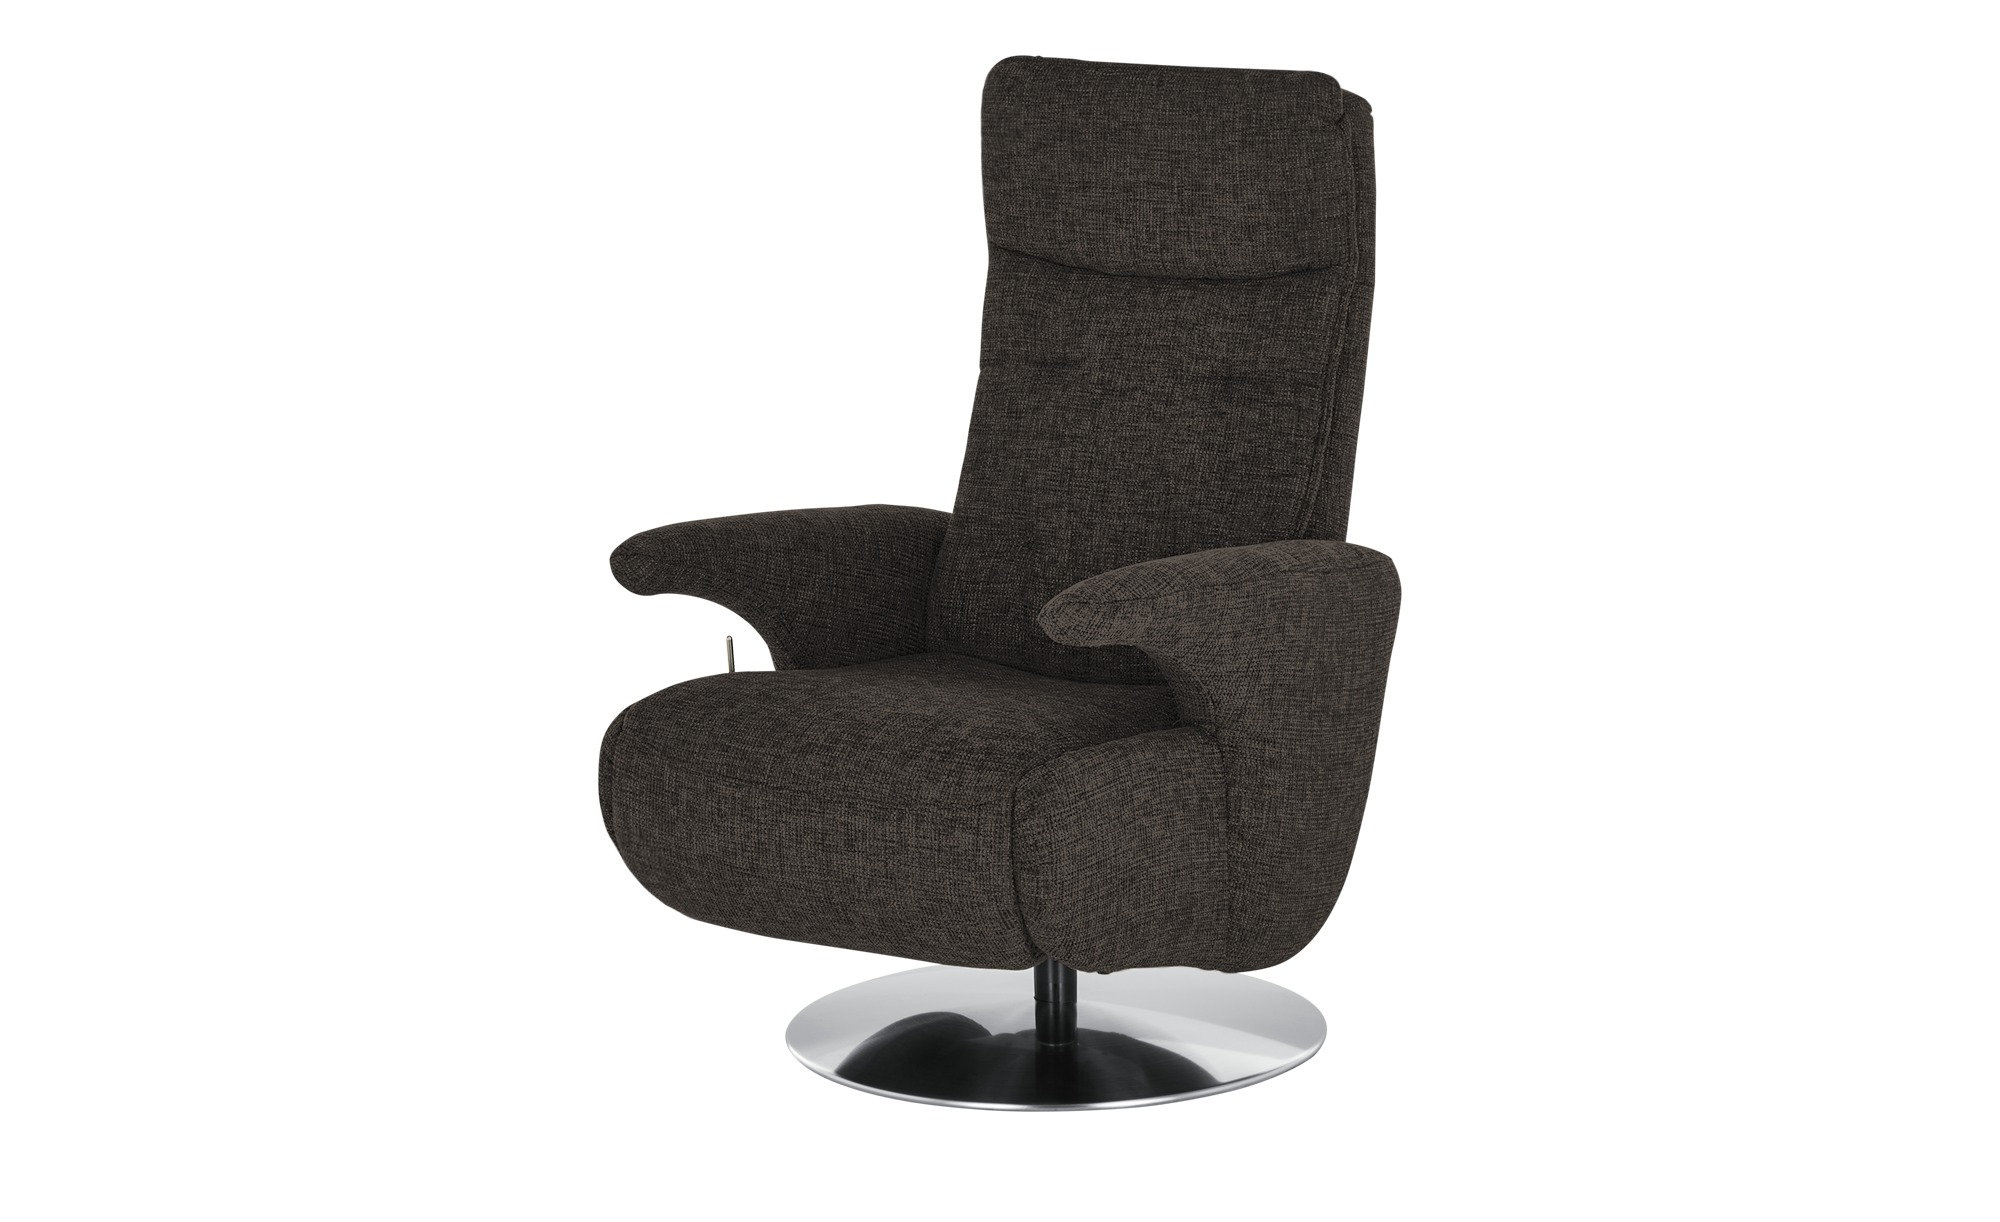 meinSofa Drehsessel  Franzi-S ¦ braun ¦ Maße (cm): B: 73 H: 113 T: 83 Polstermöbel > Sessel > Fernsehsessel - Höffner